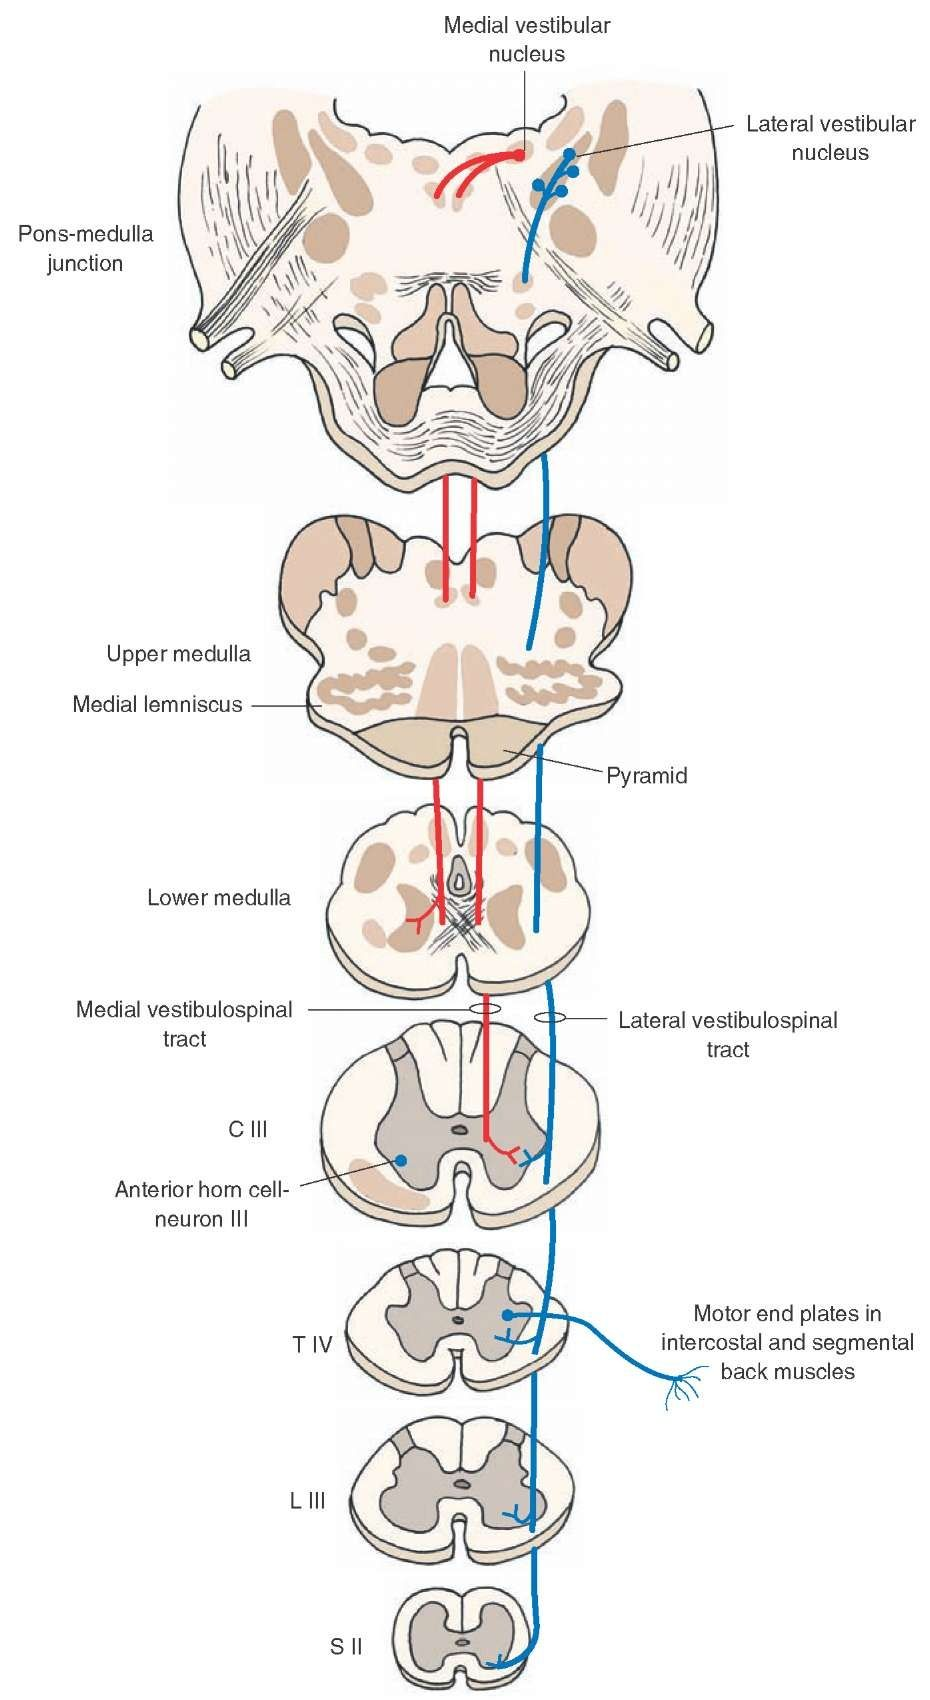 medium resolution of vestibulospinal tracts nervous system parts nervous system anatomy central nervous system brain anatomy